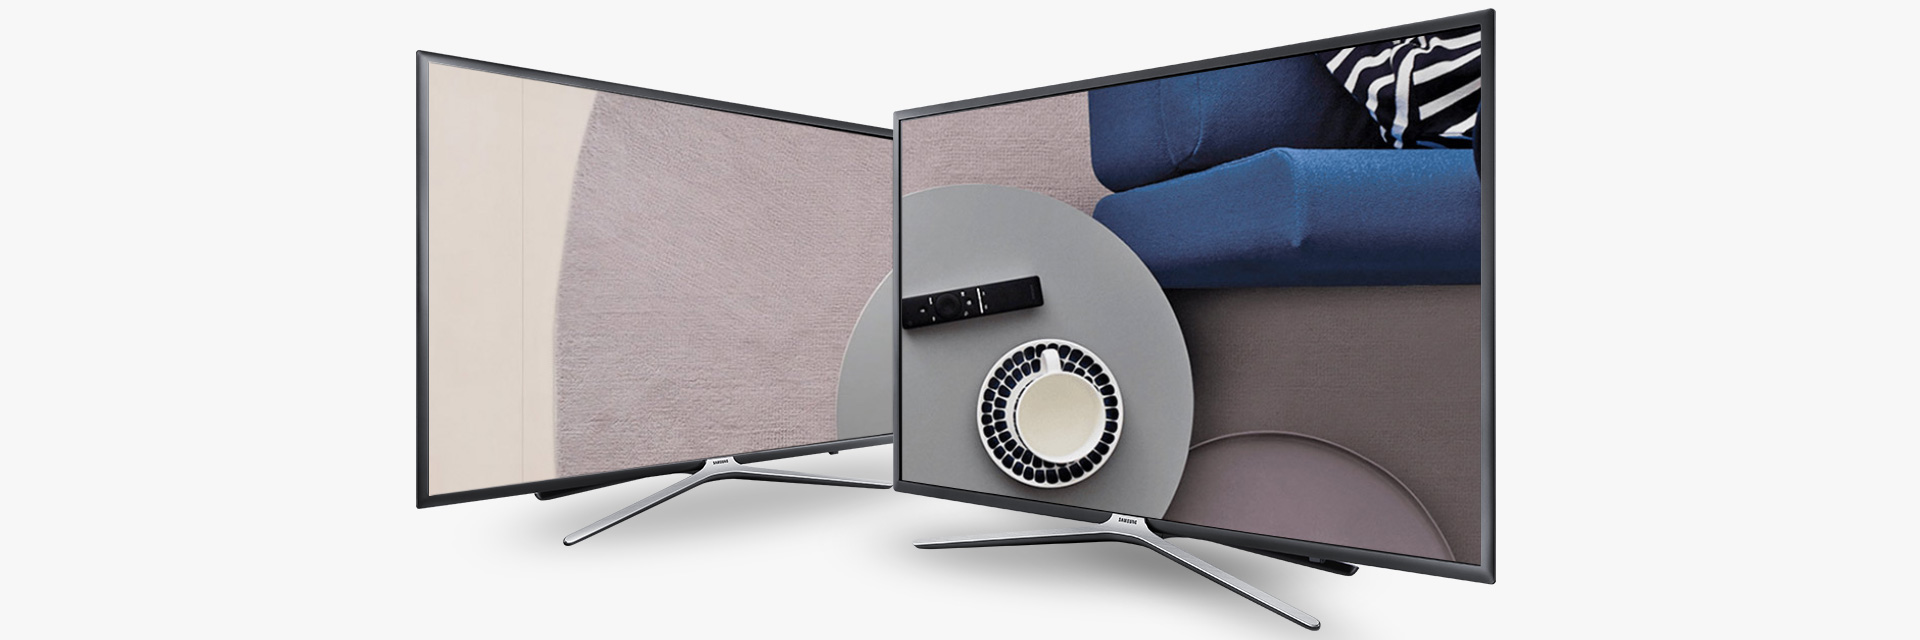 Tv Samsung M5500 stílusos design 1920x640